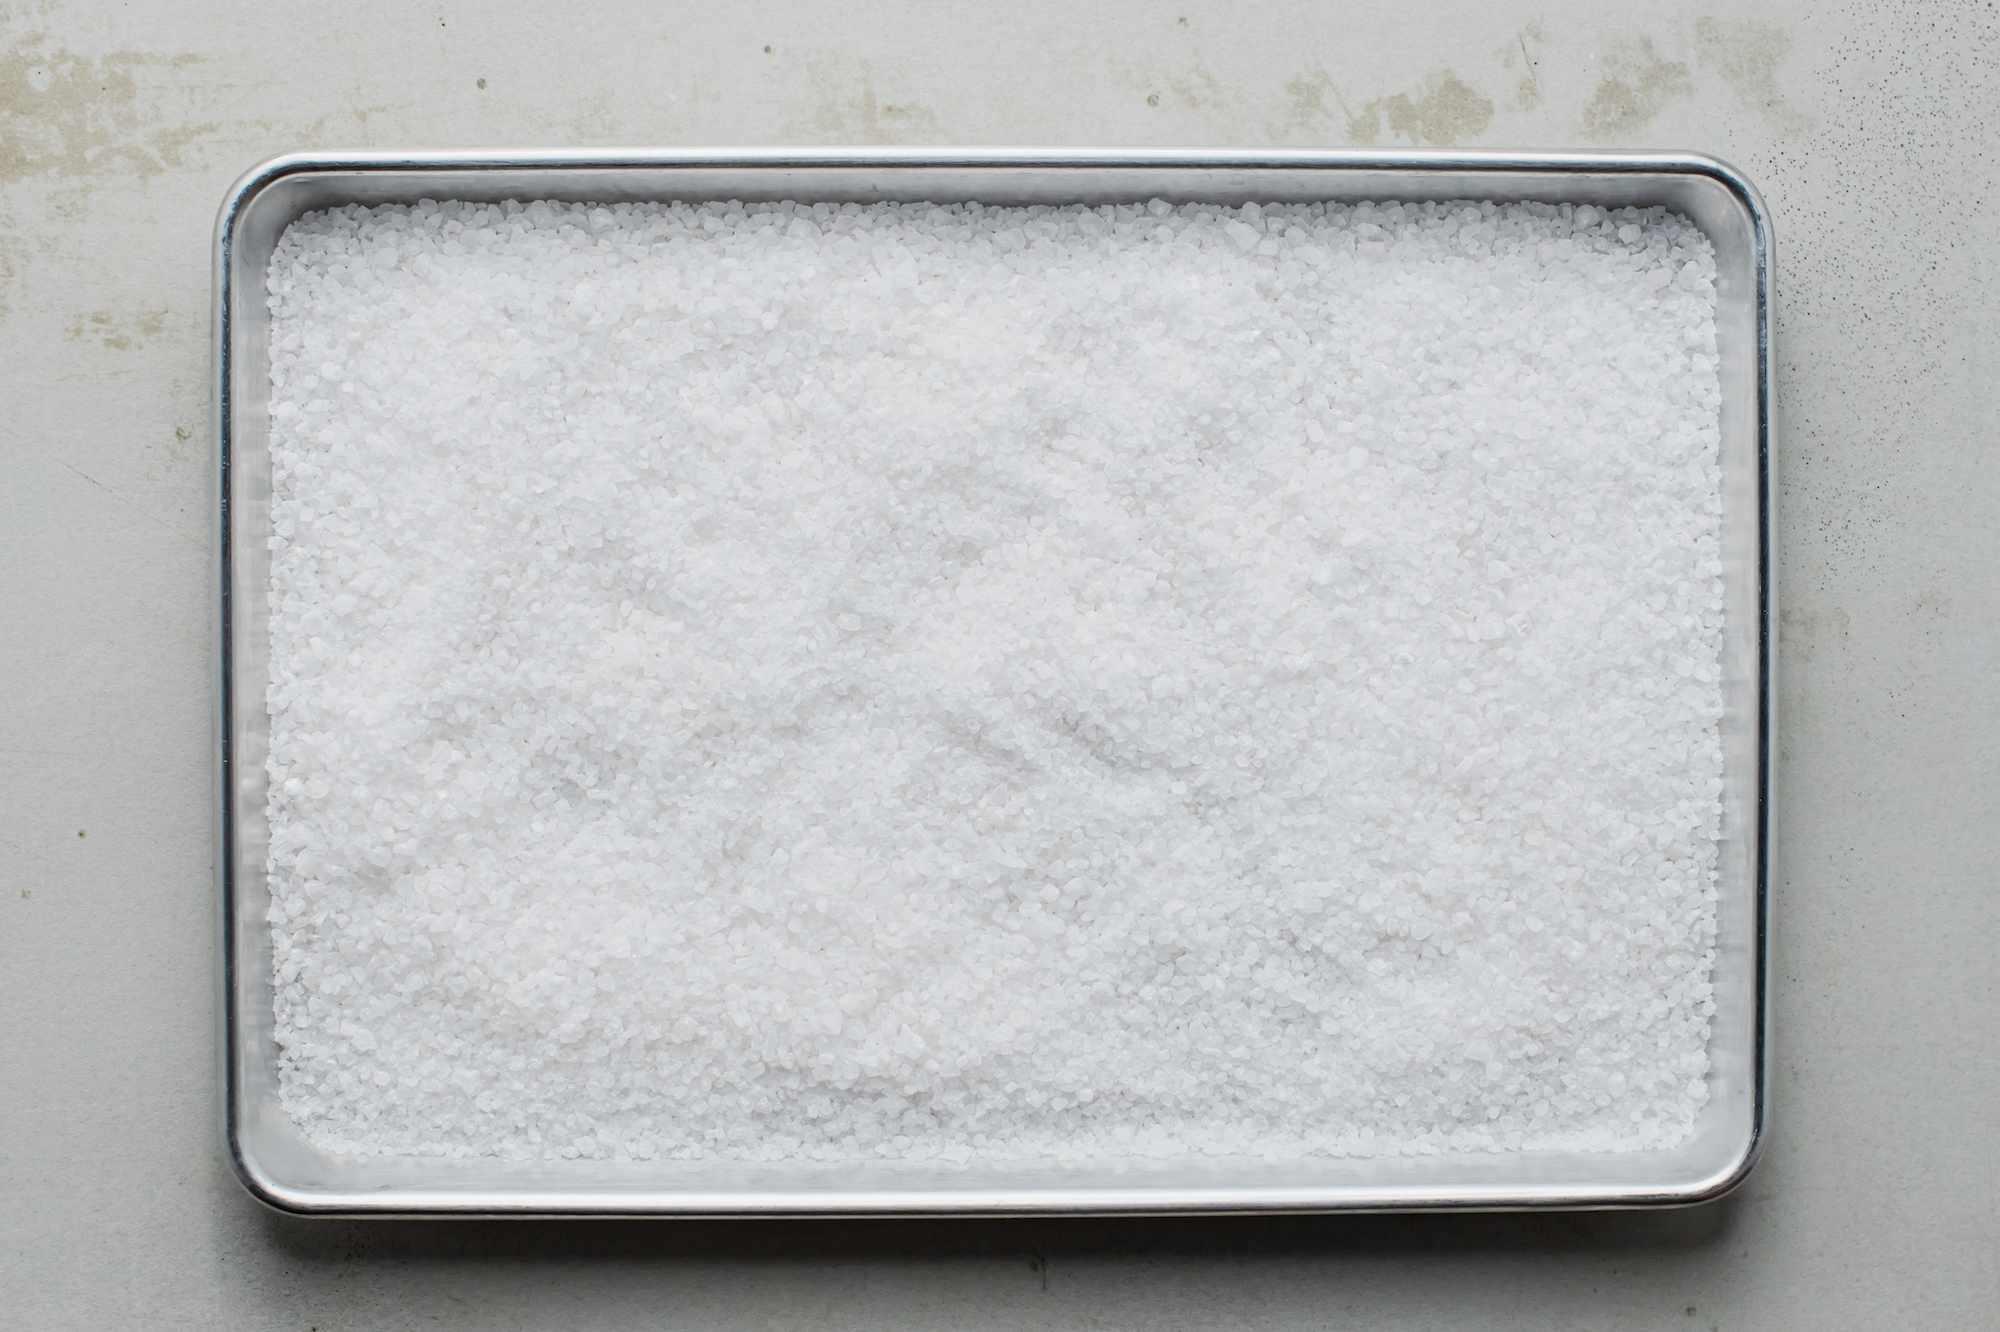 Rock salt in a pan